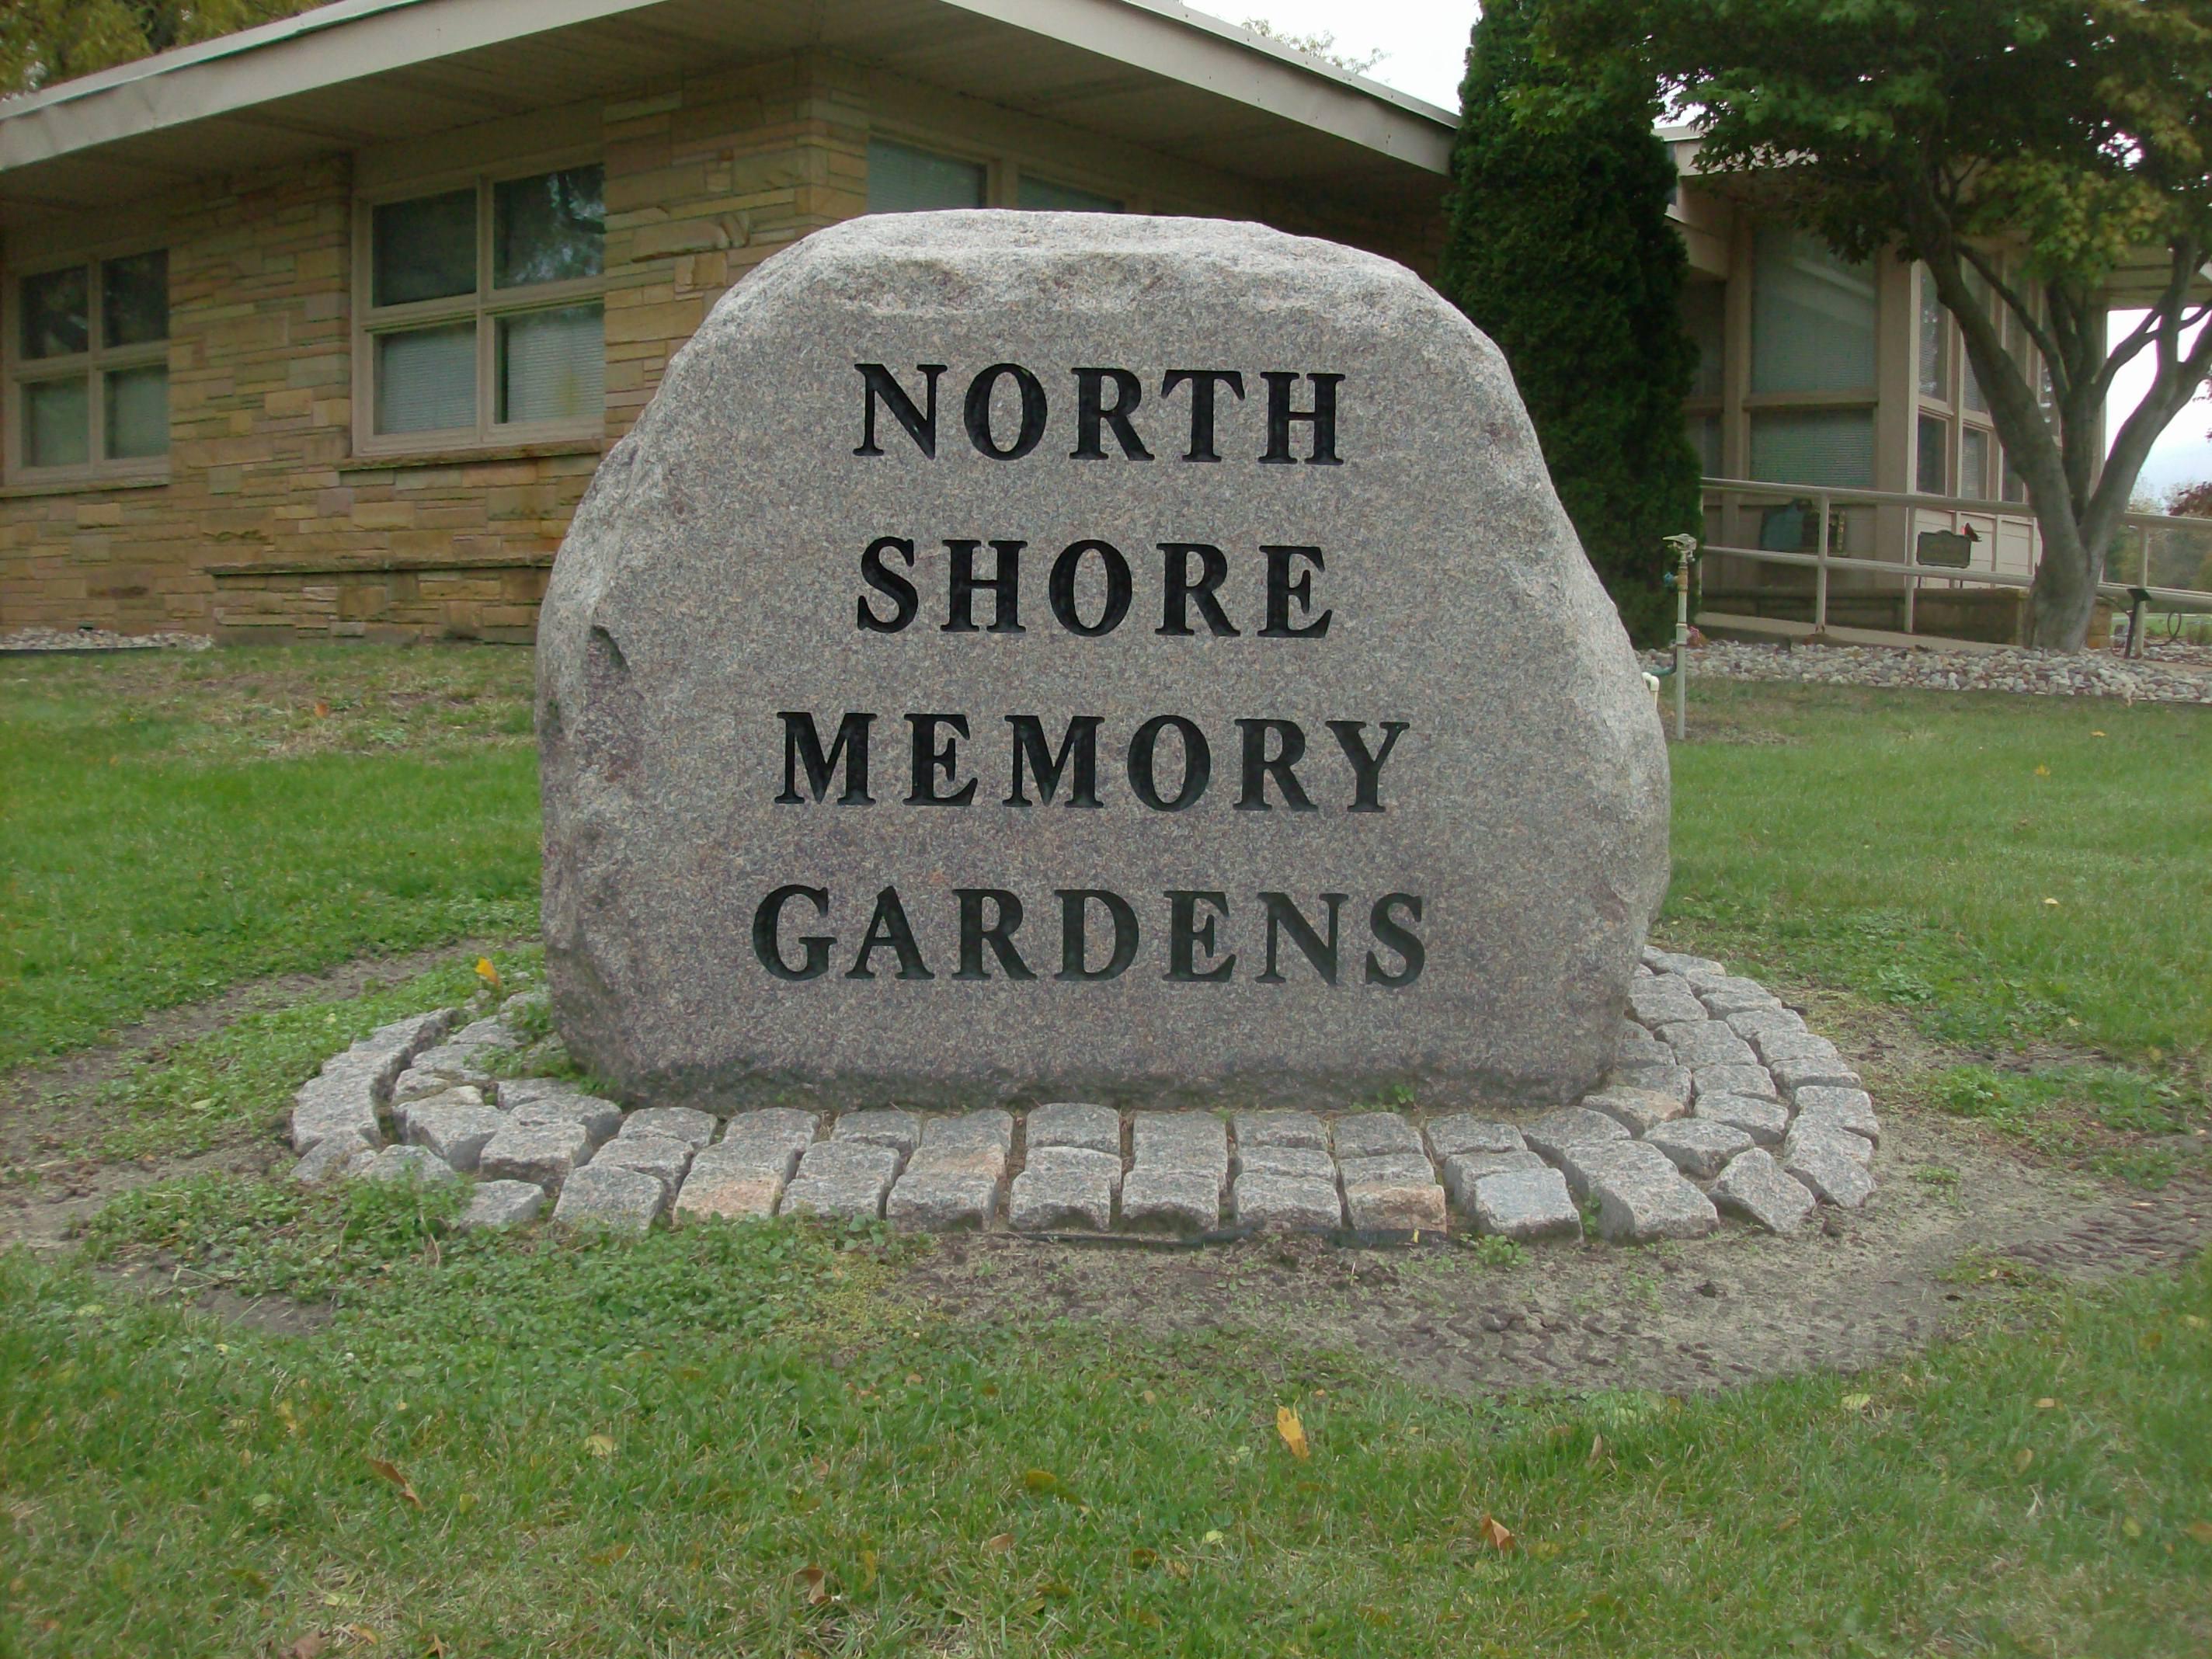 North Shore Memory Gardens